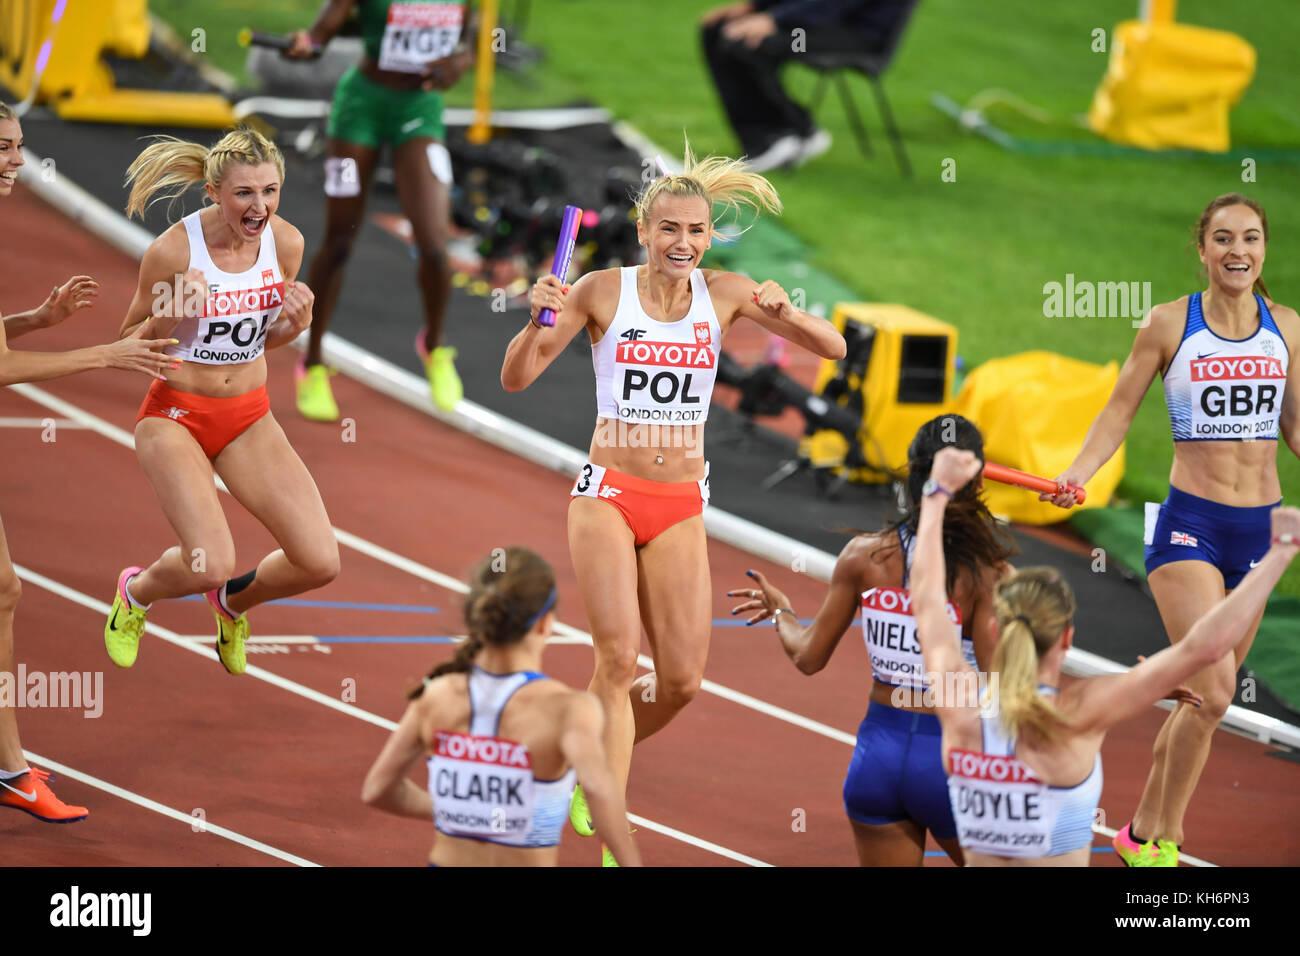 Polish team celebration - 4x400 Metres Relay women - IAAF World Championships - London 2017 - Stock Image